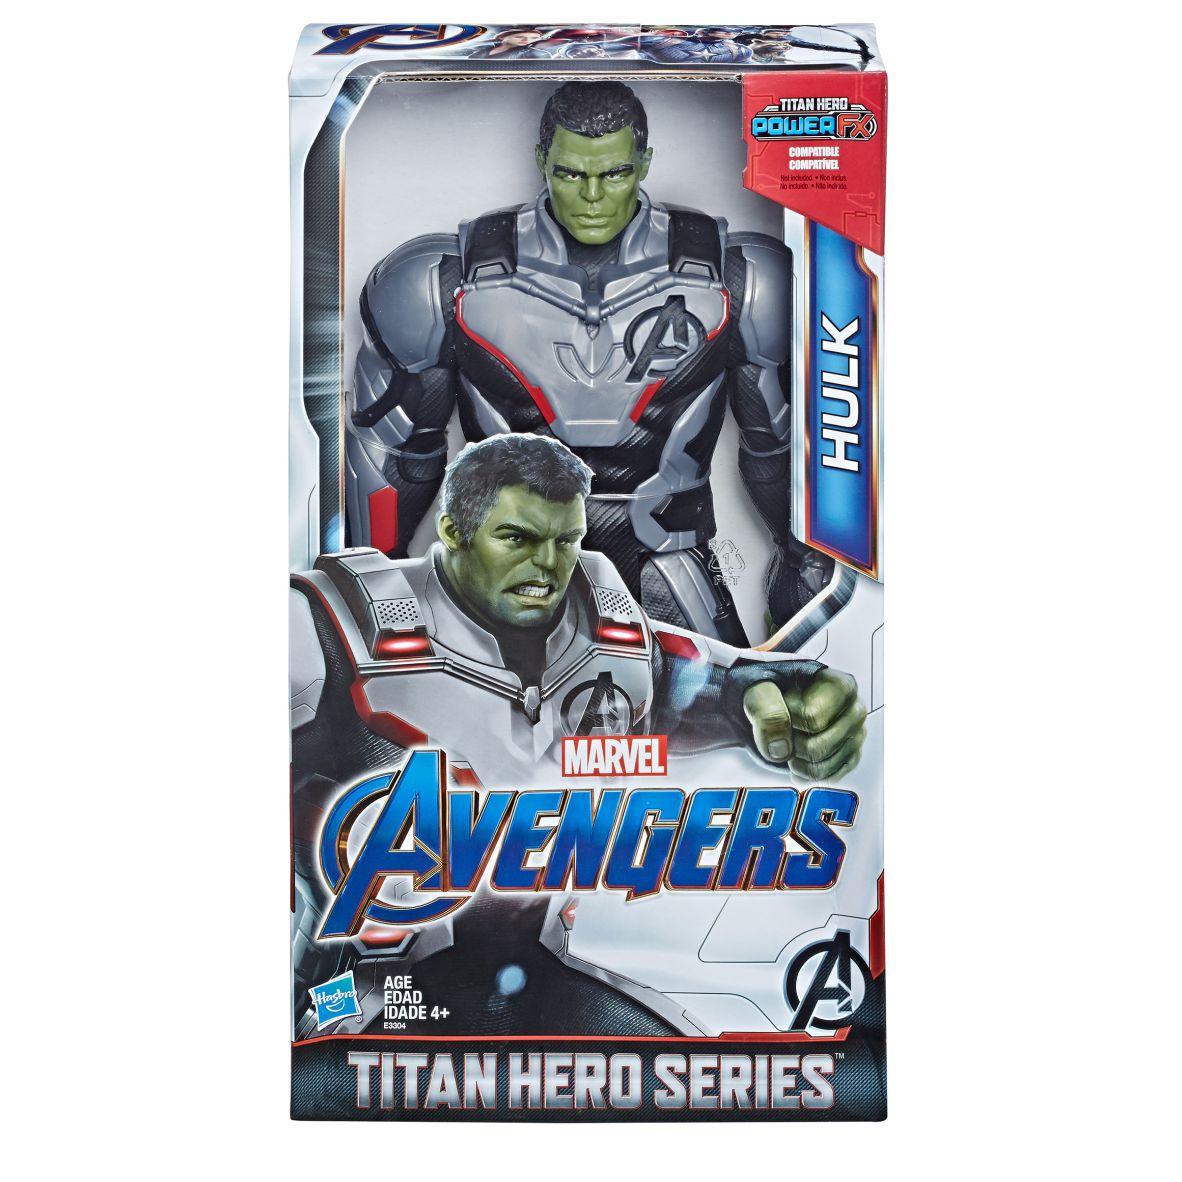 Boneco Articulado Titan Hulk Power FX Avengers - Hasbro